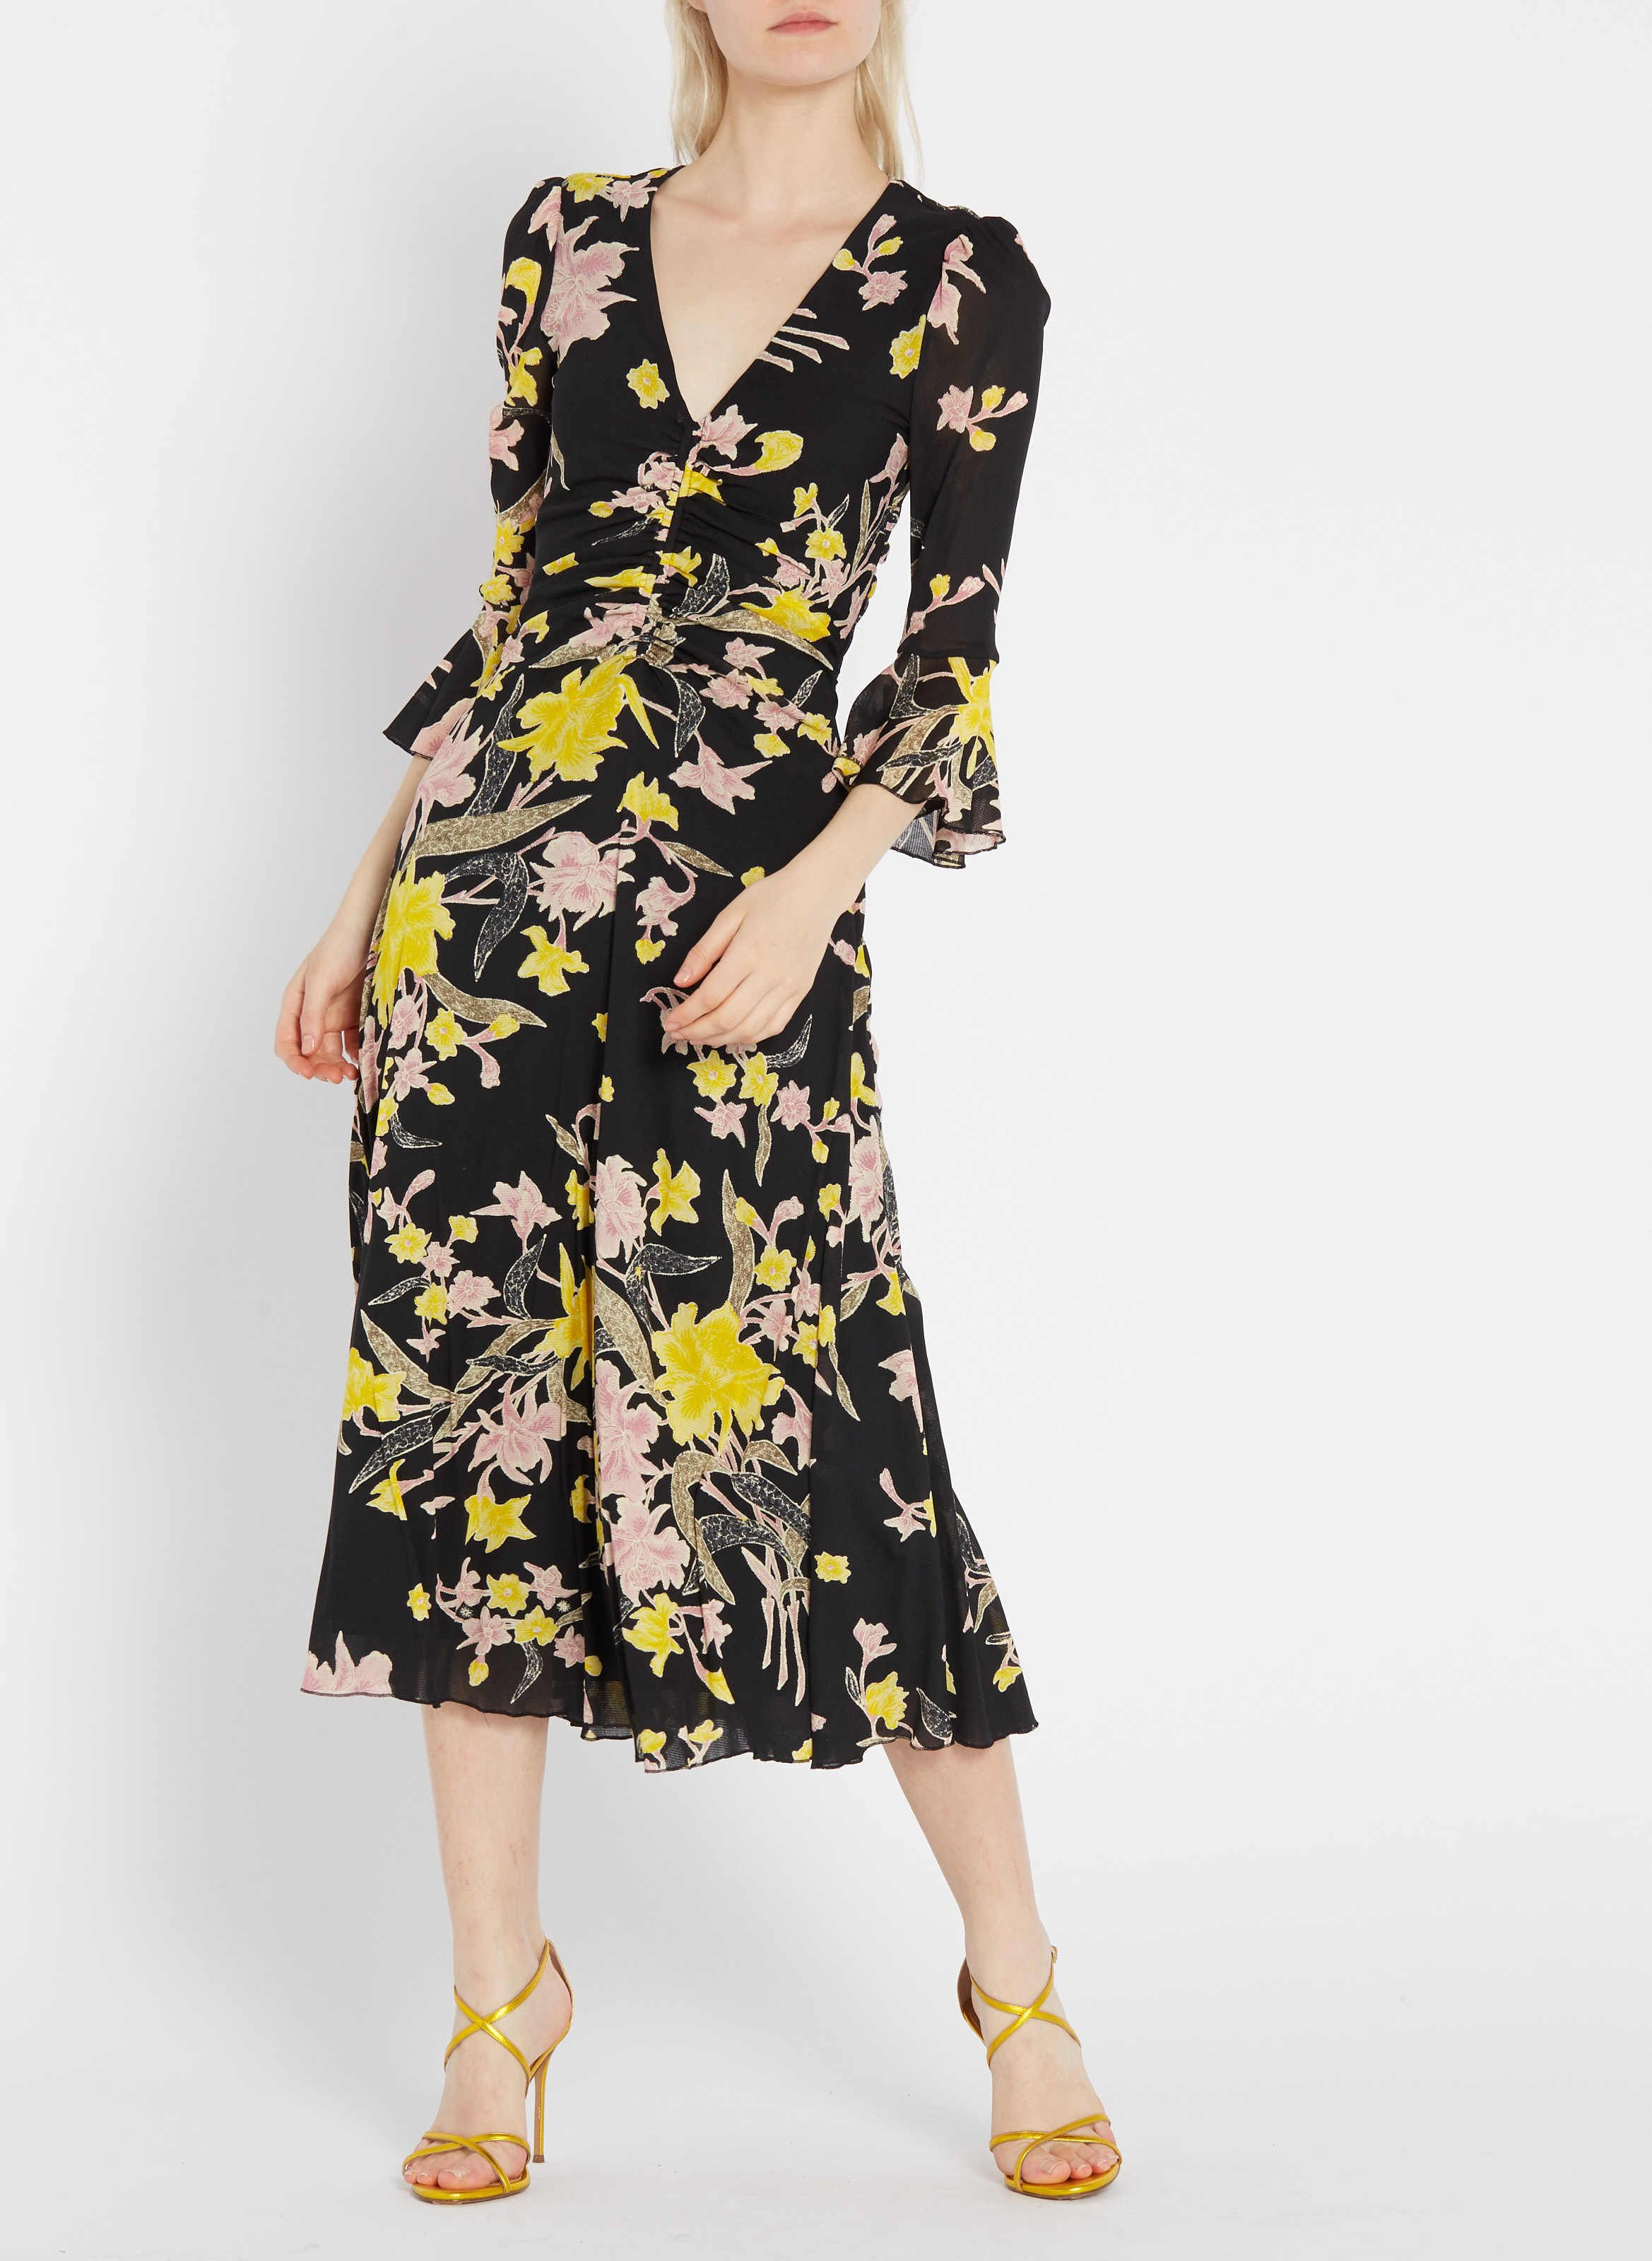 Robe Midi Col V Imprimee Floating Bouquet Black Diane Von Furstenberg Createurs Place Des Tendances Diane V Dresses Dresses With Sleeves Long Sleeve Dress